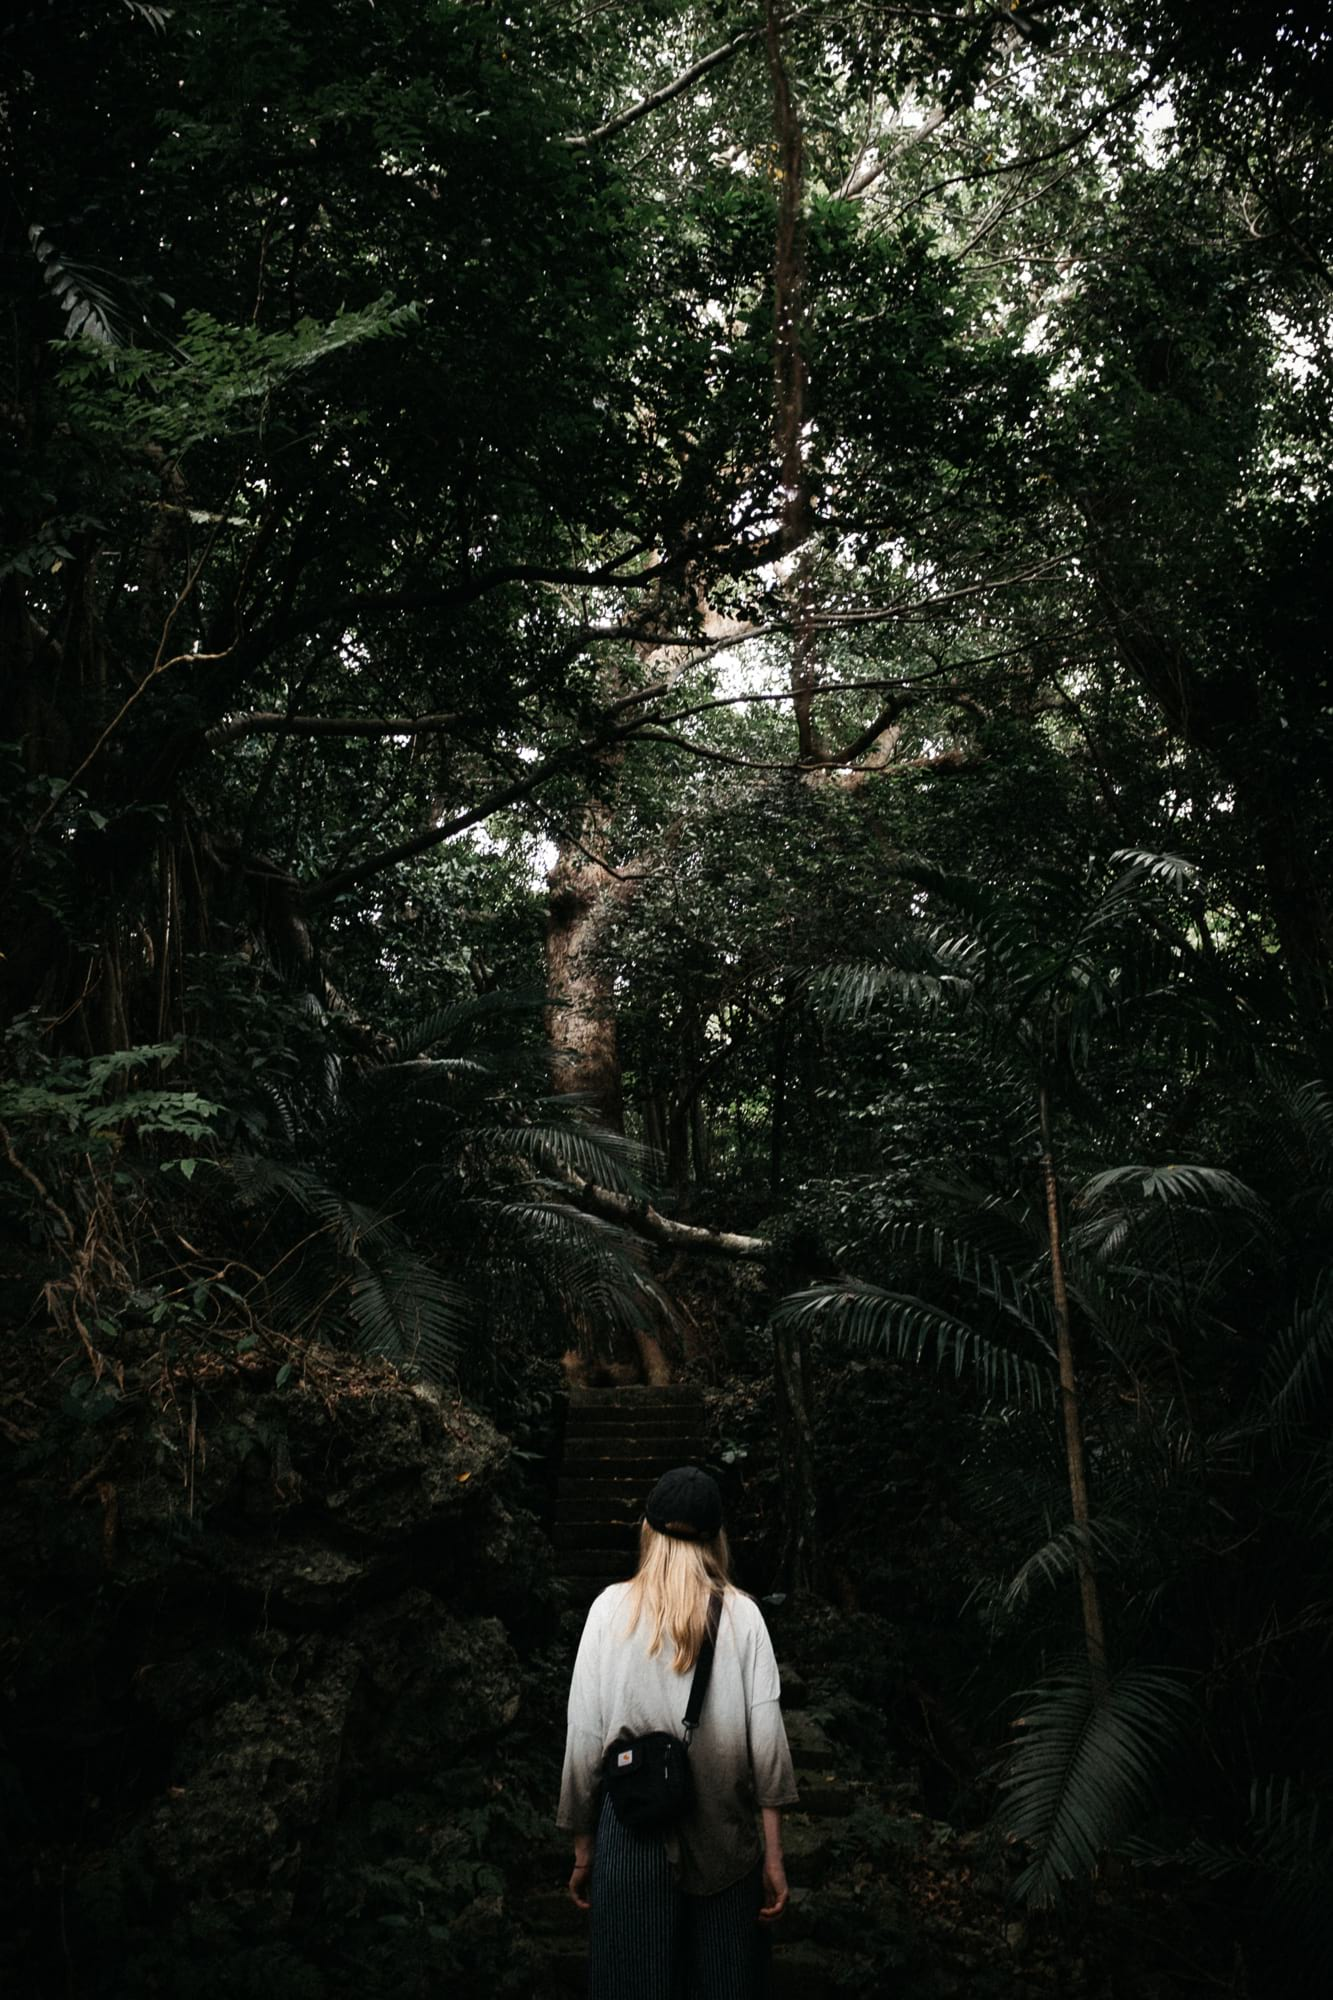 waltsmedia-portrait-taiwan-taipeh-travel-reise-53